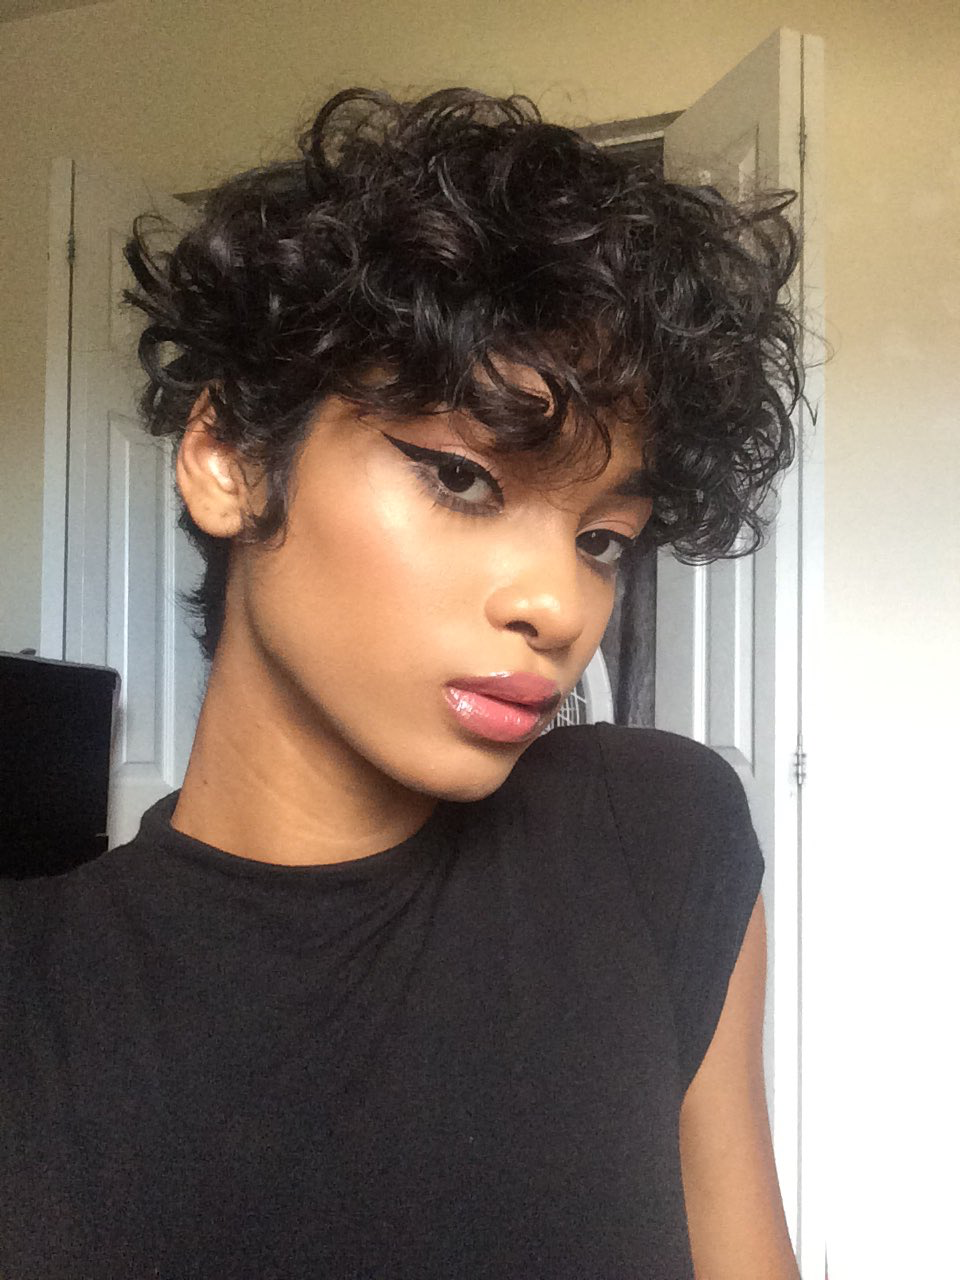 pinterest @lavenderrosegold | hair inspiration in 2019